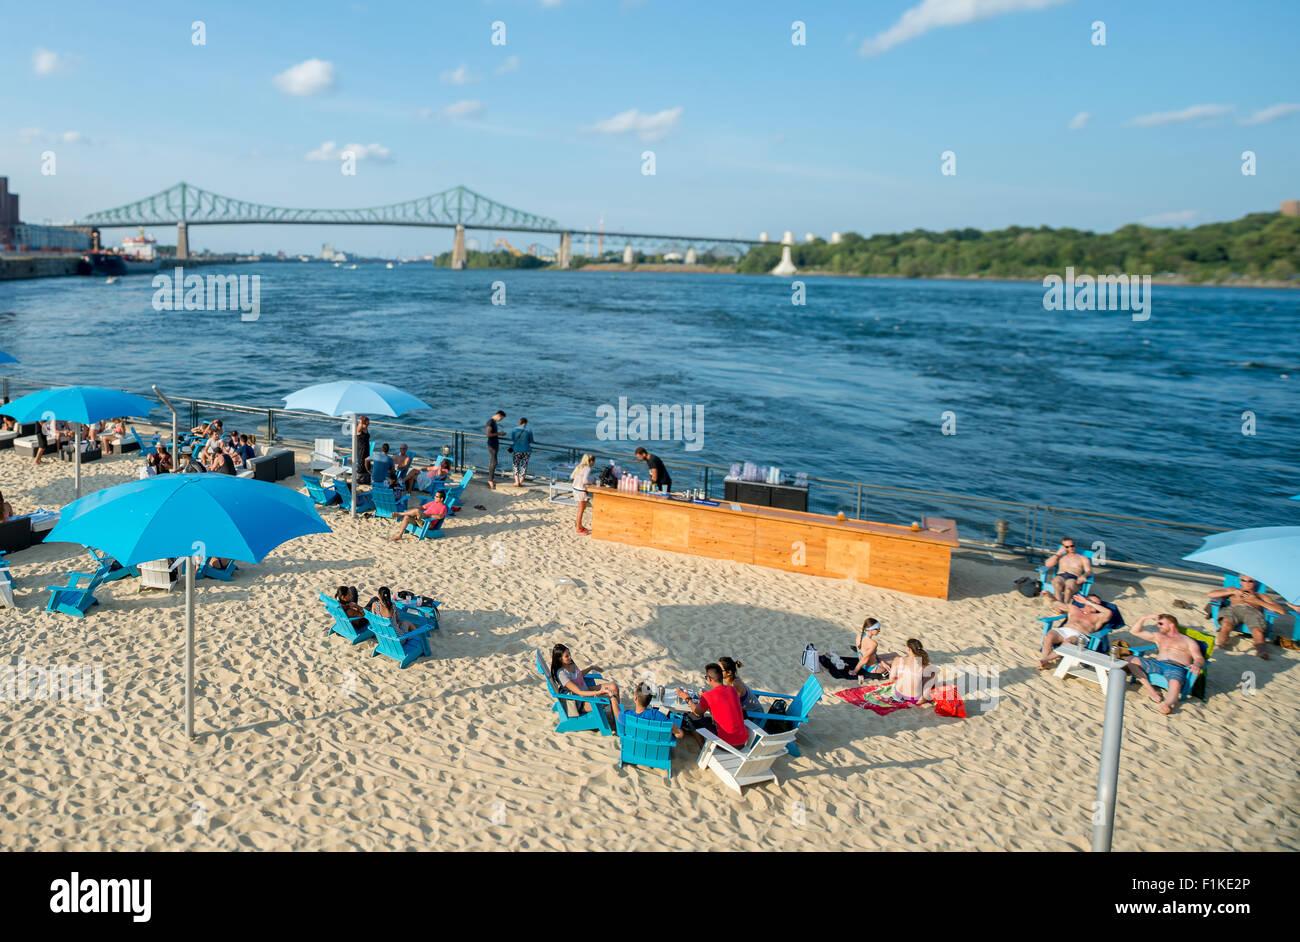 Montreal Clock Tower beach on Saint Lawrence river, tilt shift effect - Stock Image